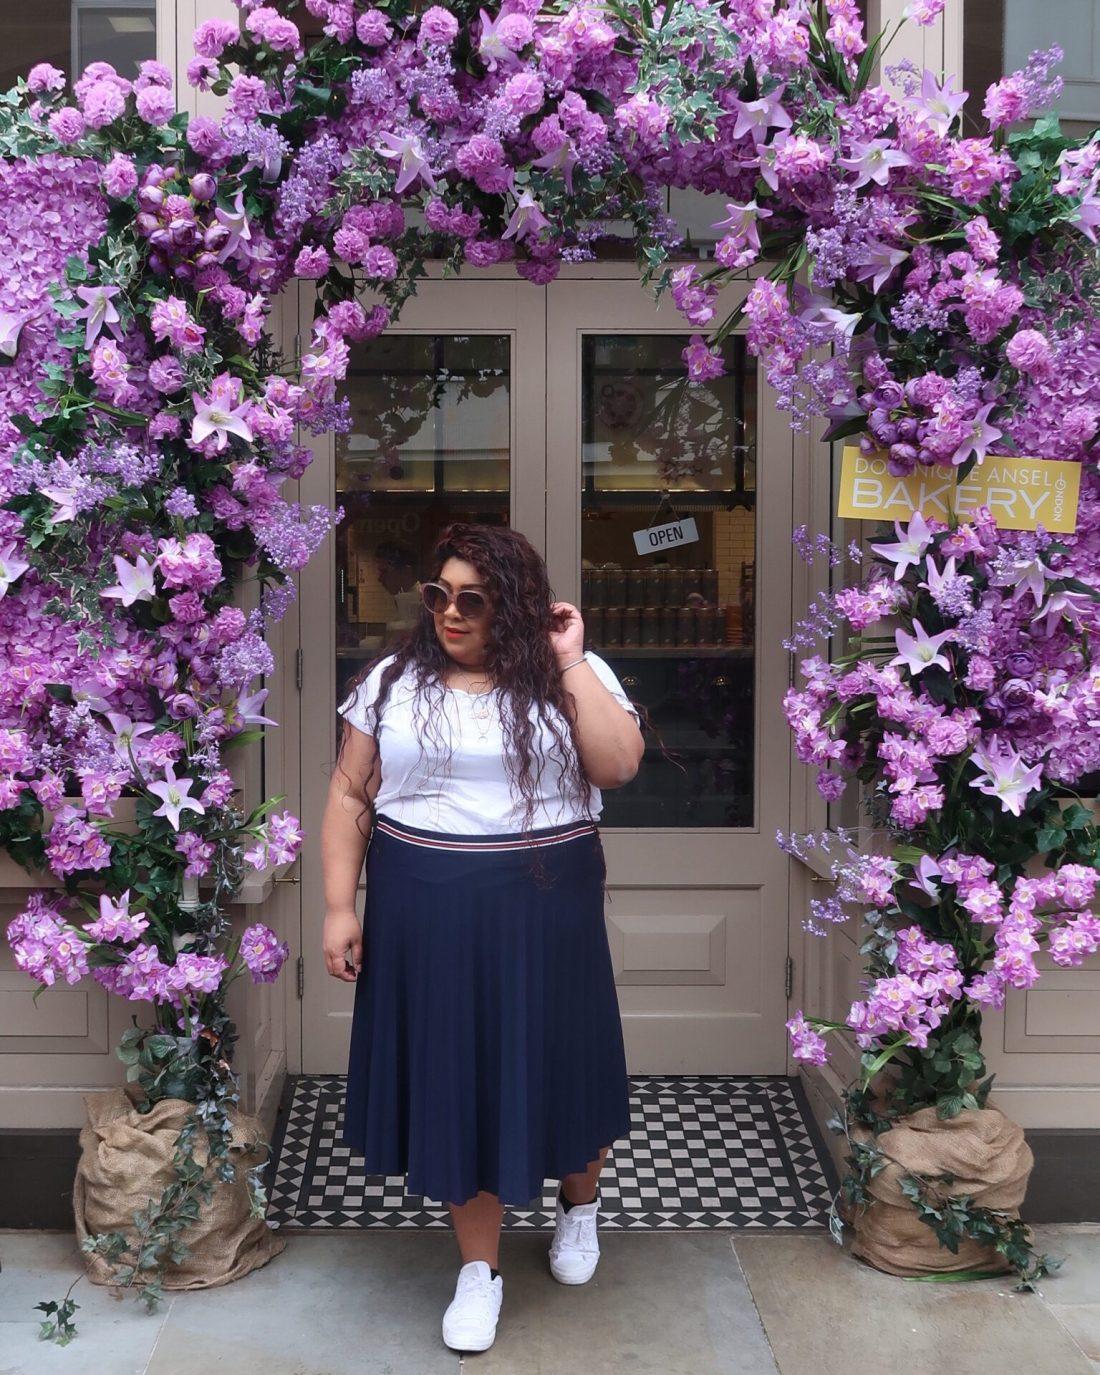 THE MOST INSTAGRAMMABLE PLACES IN BELGRAVIA LONDON, the best instagram photography spots in belgravia, nishi v, #nishitravels, moyses stevens, peggy porschen, les senteurs, dominique ansel